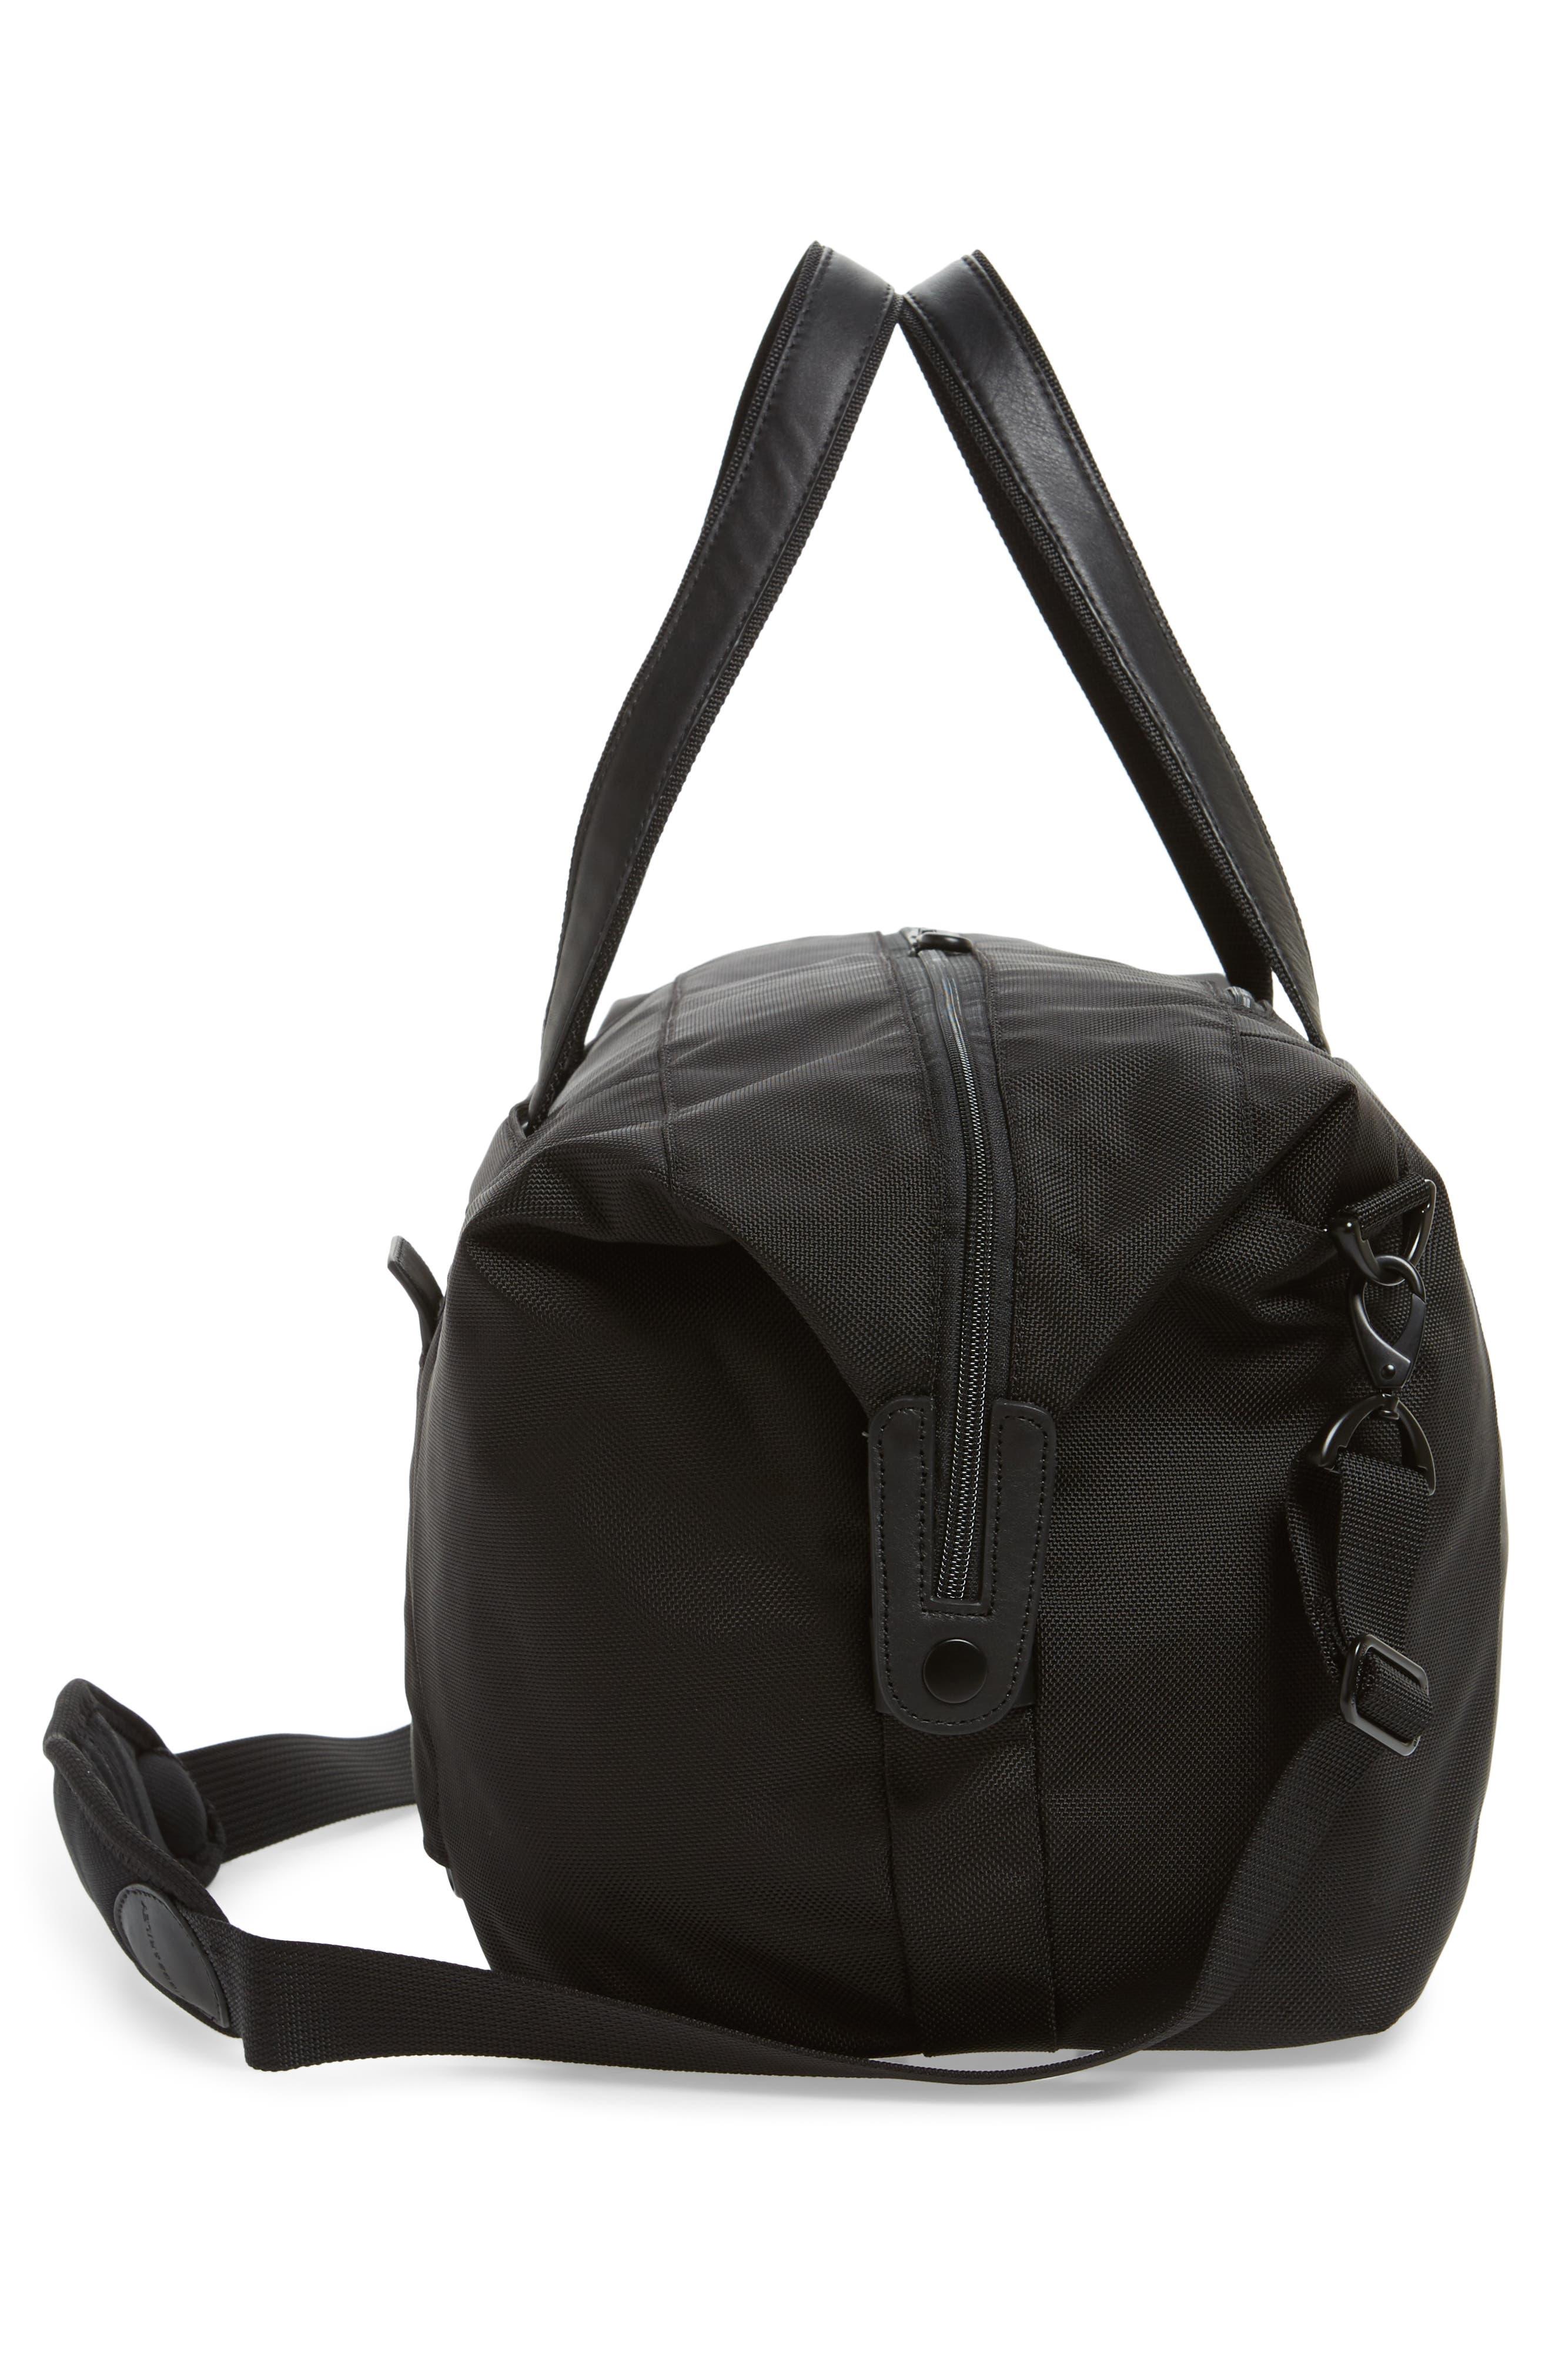 BRIGGS & RILEY,                             'Baseline' Duffel Bag,                             Alternate thumbnail 5, color,                             BLACK